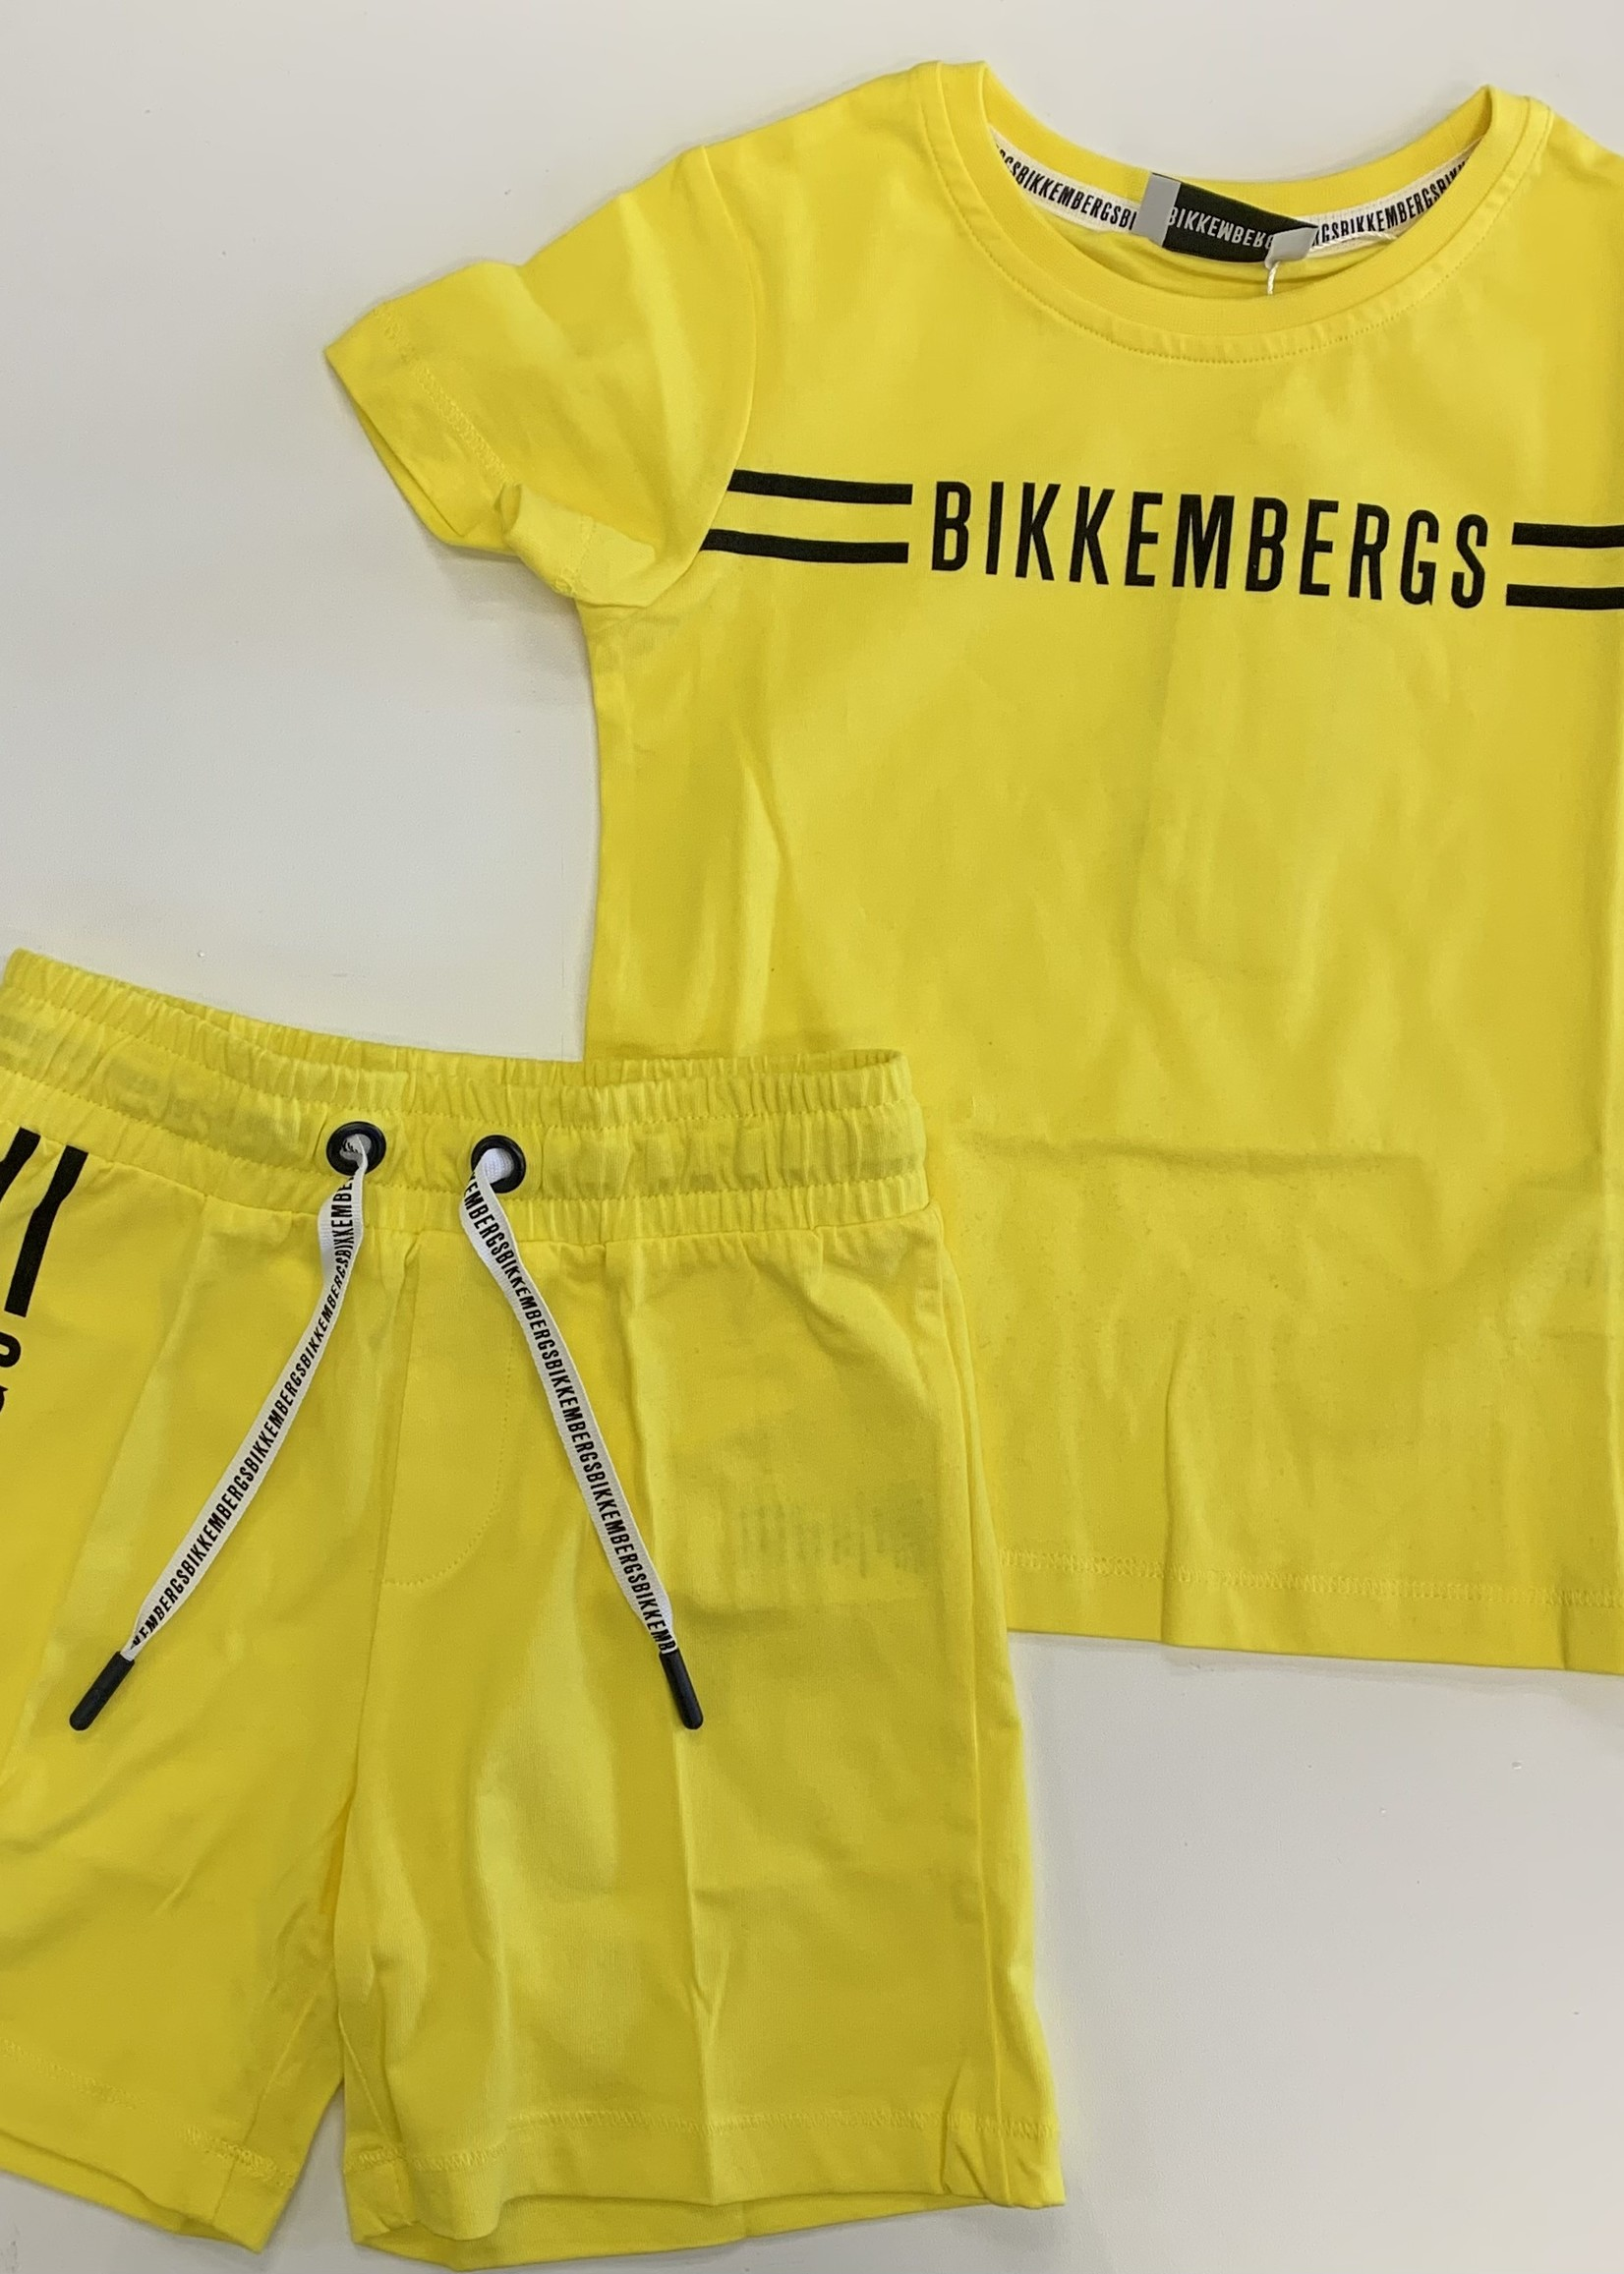 Bikkembergs Bikkembergs 2pc set yellow